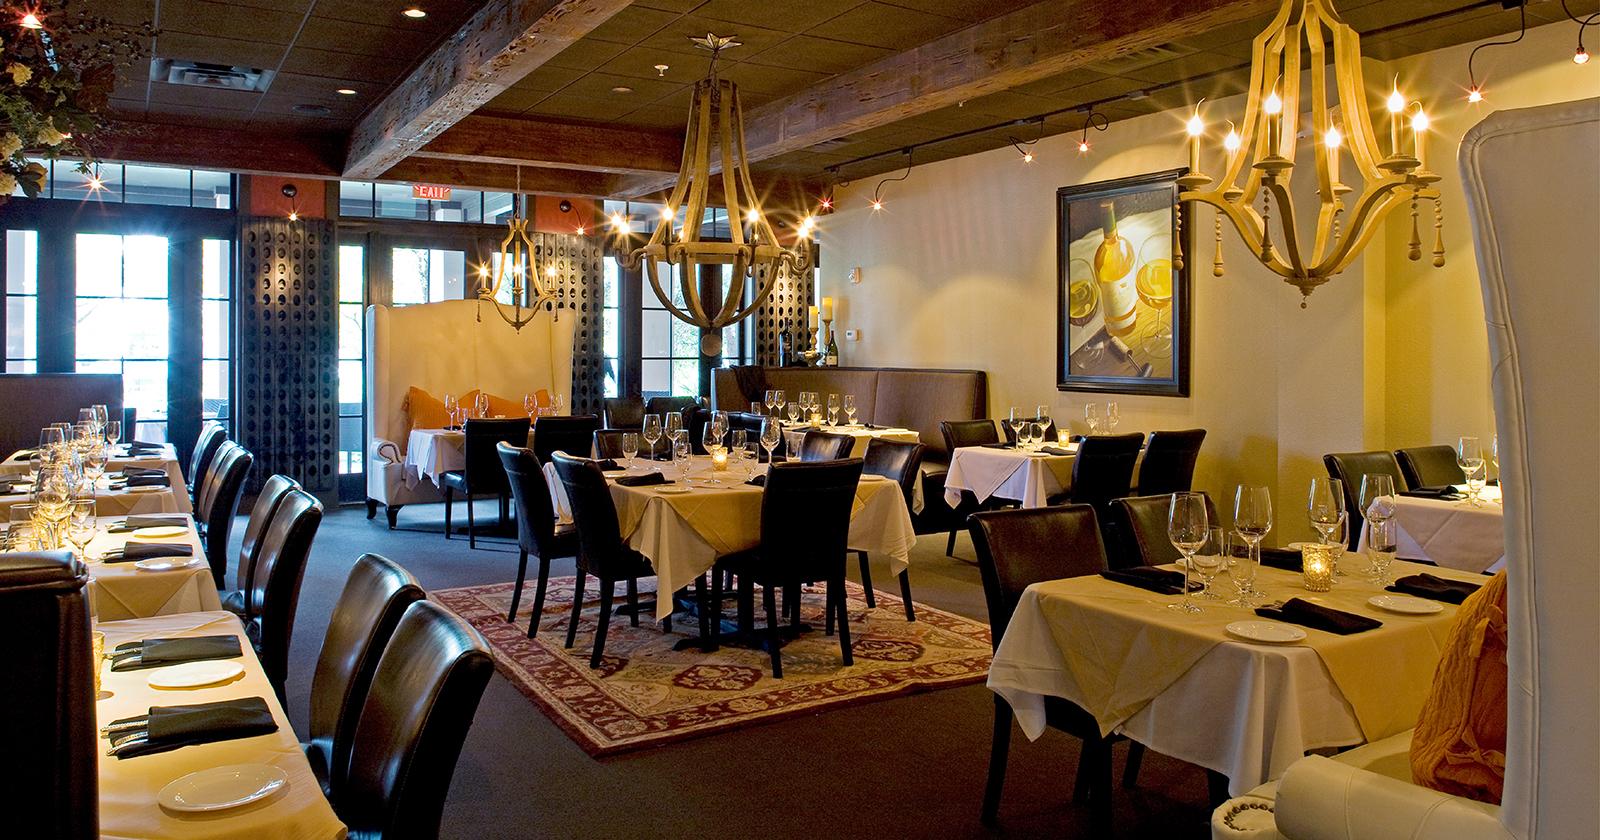 Restaurant Paradis, Rosemary Beach, FL